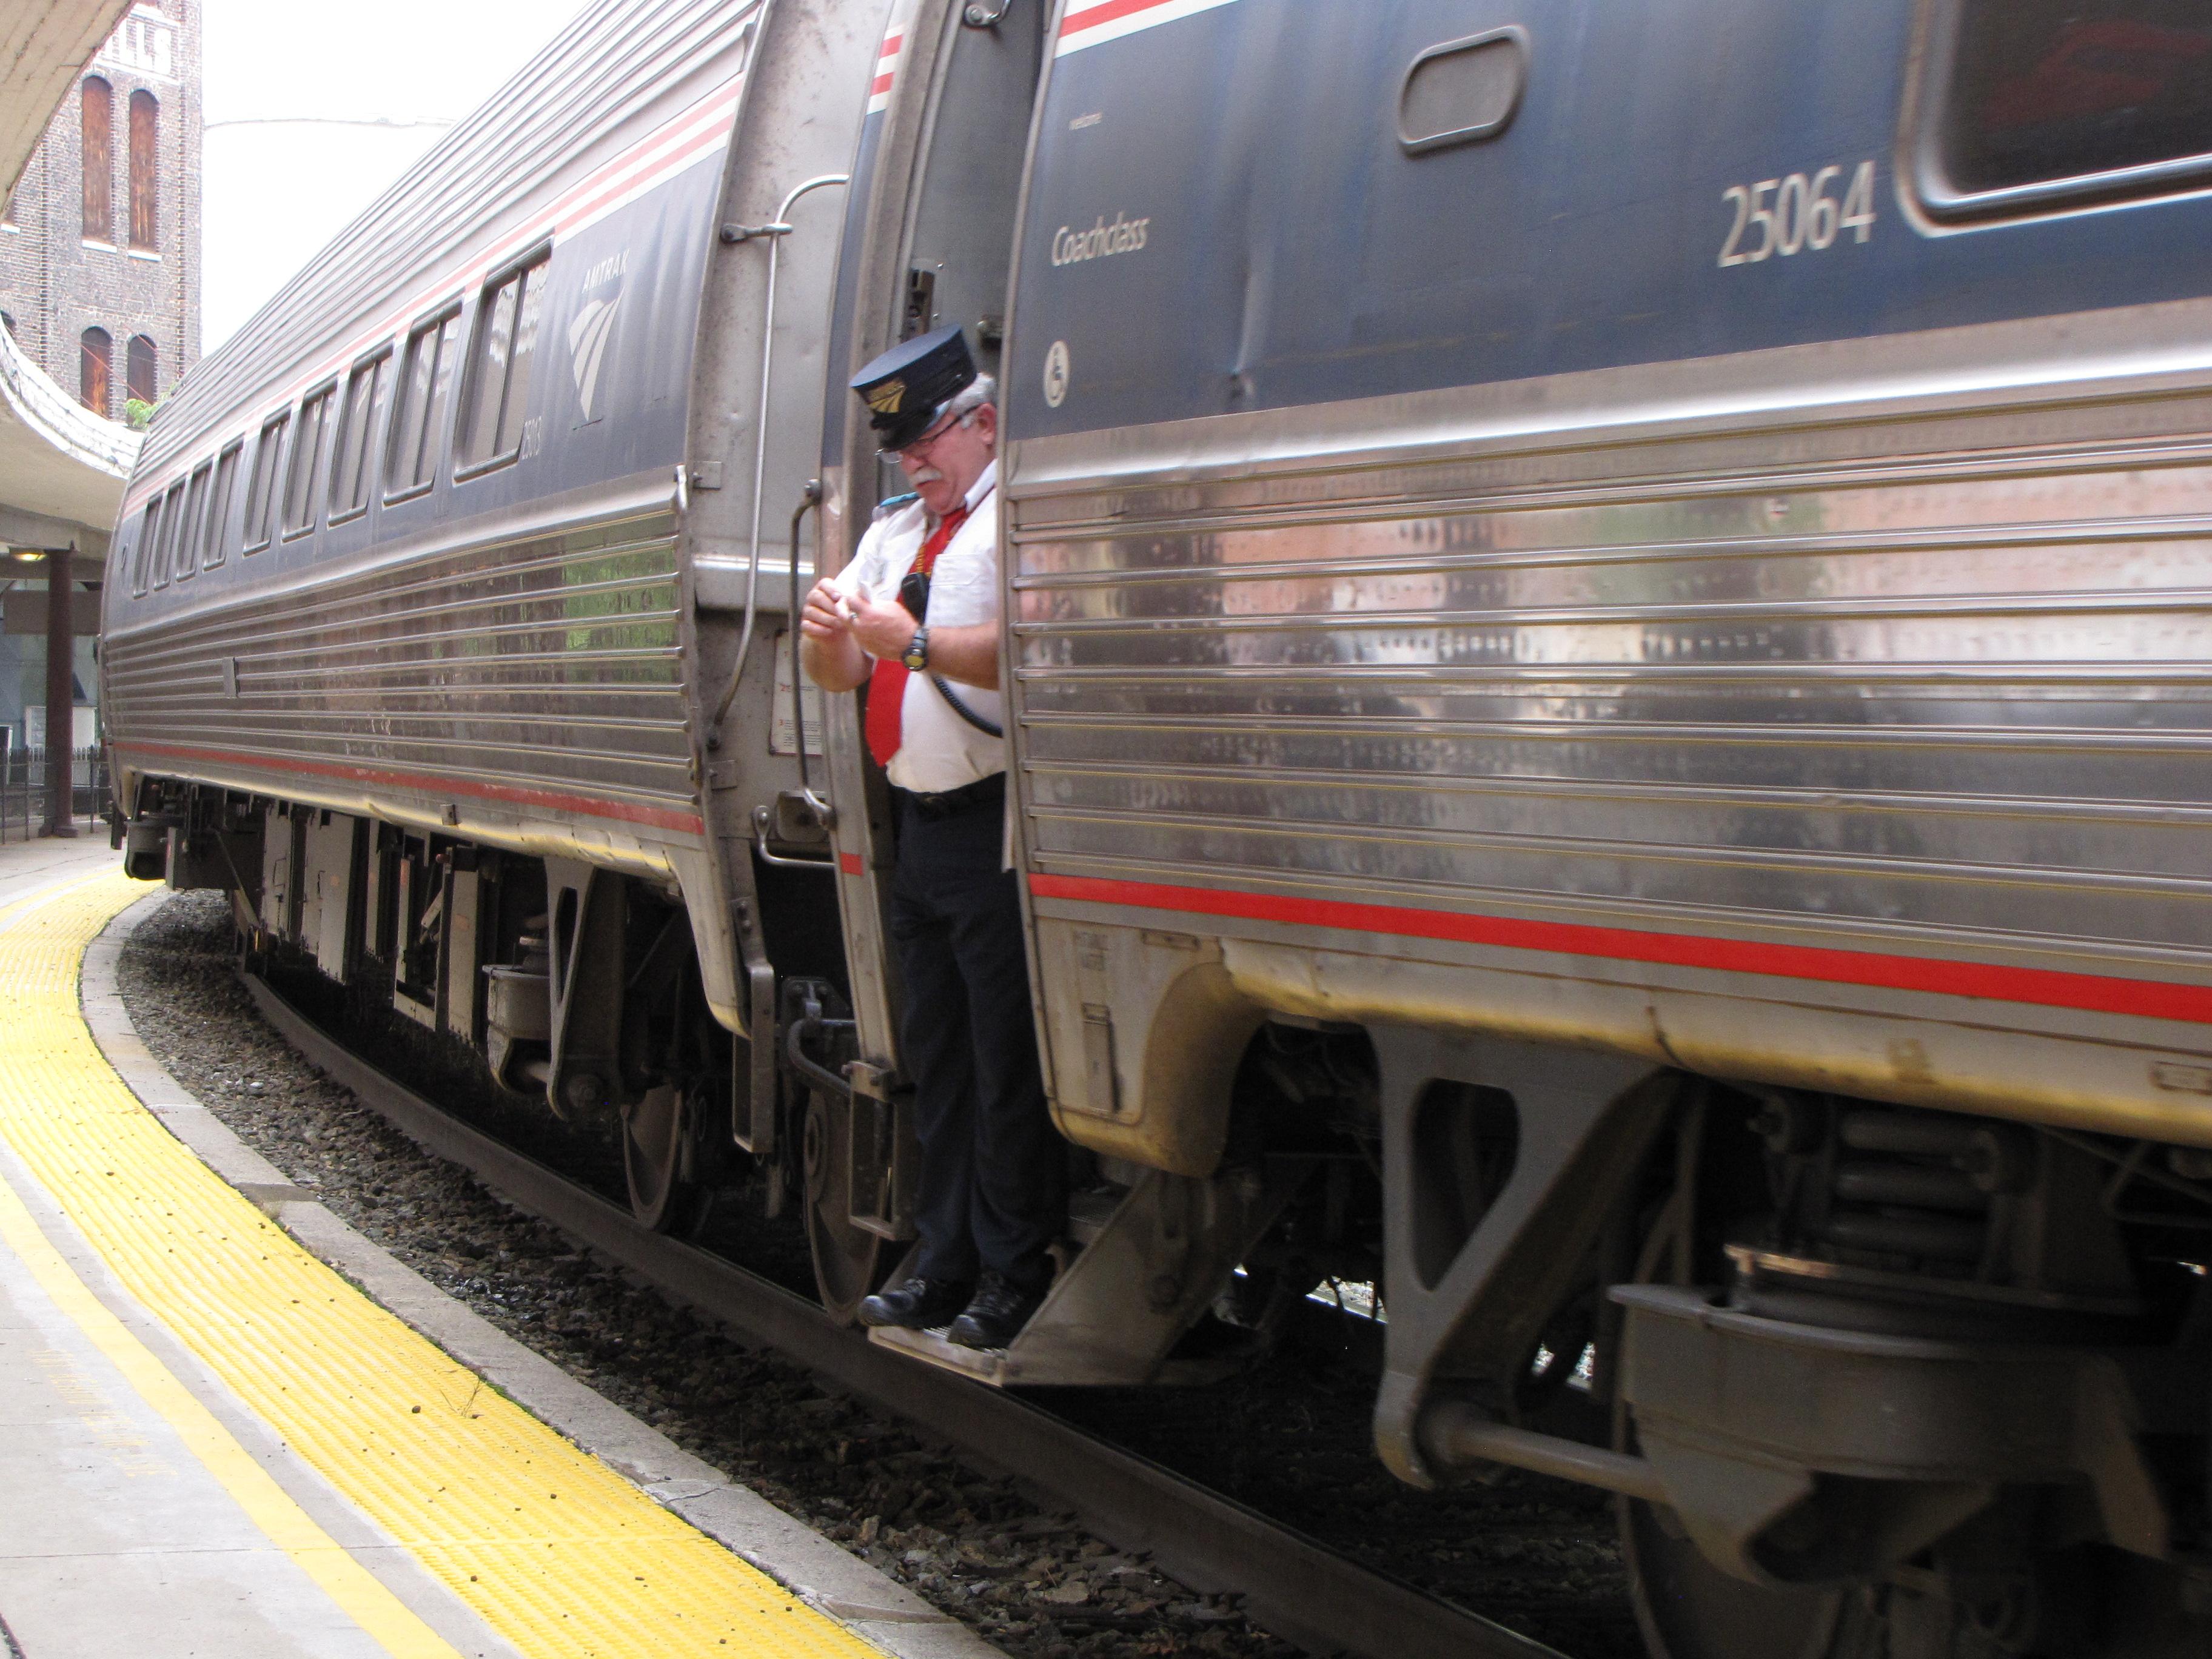 File:Amtrak conductor stands in train door as westbound Cardinal departs Staunton.jpg & File:Amtrak conductor stands in train door as westbound Cardinal ... Pezcame.Com